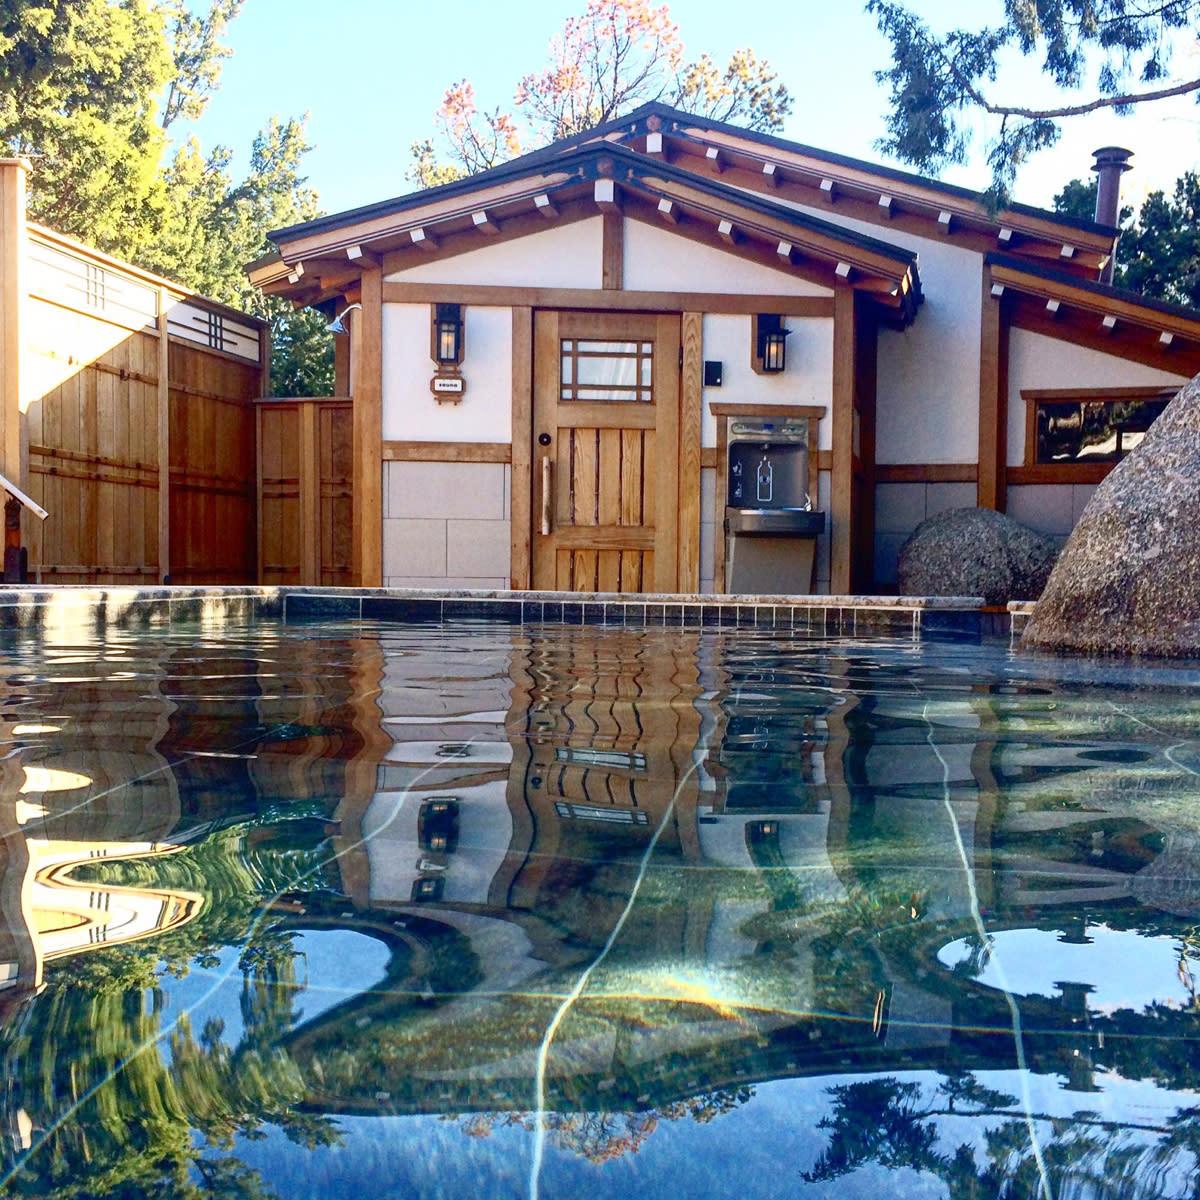 Ten Thousand Waves Japanese Health Spa & Resort